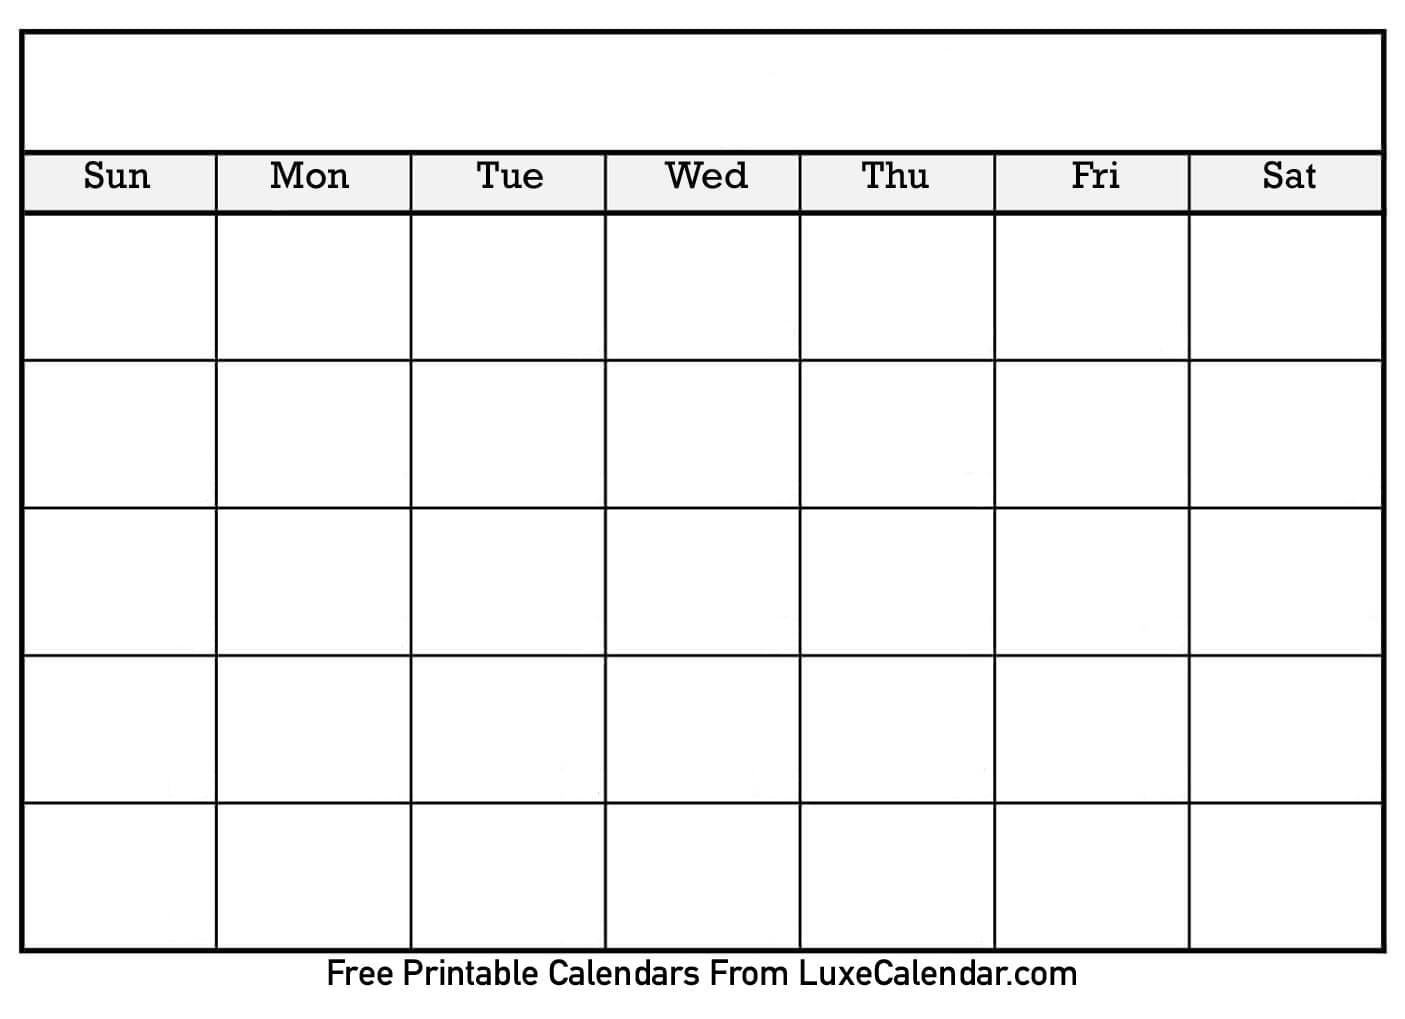 Blank Printable Calendar - Luxe Calendar in Free Blank Calendars By Month